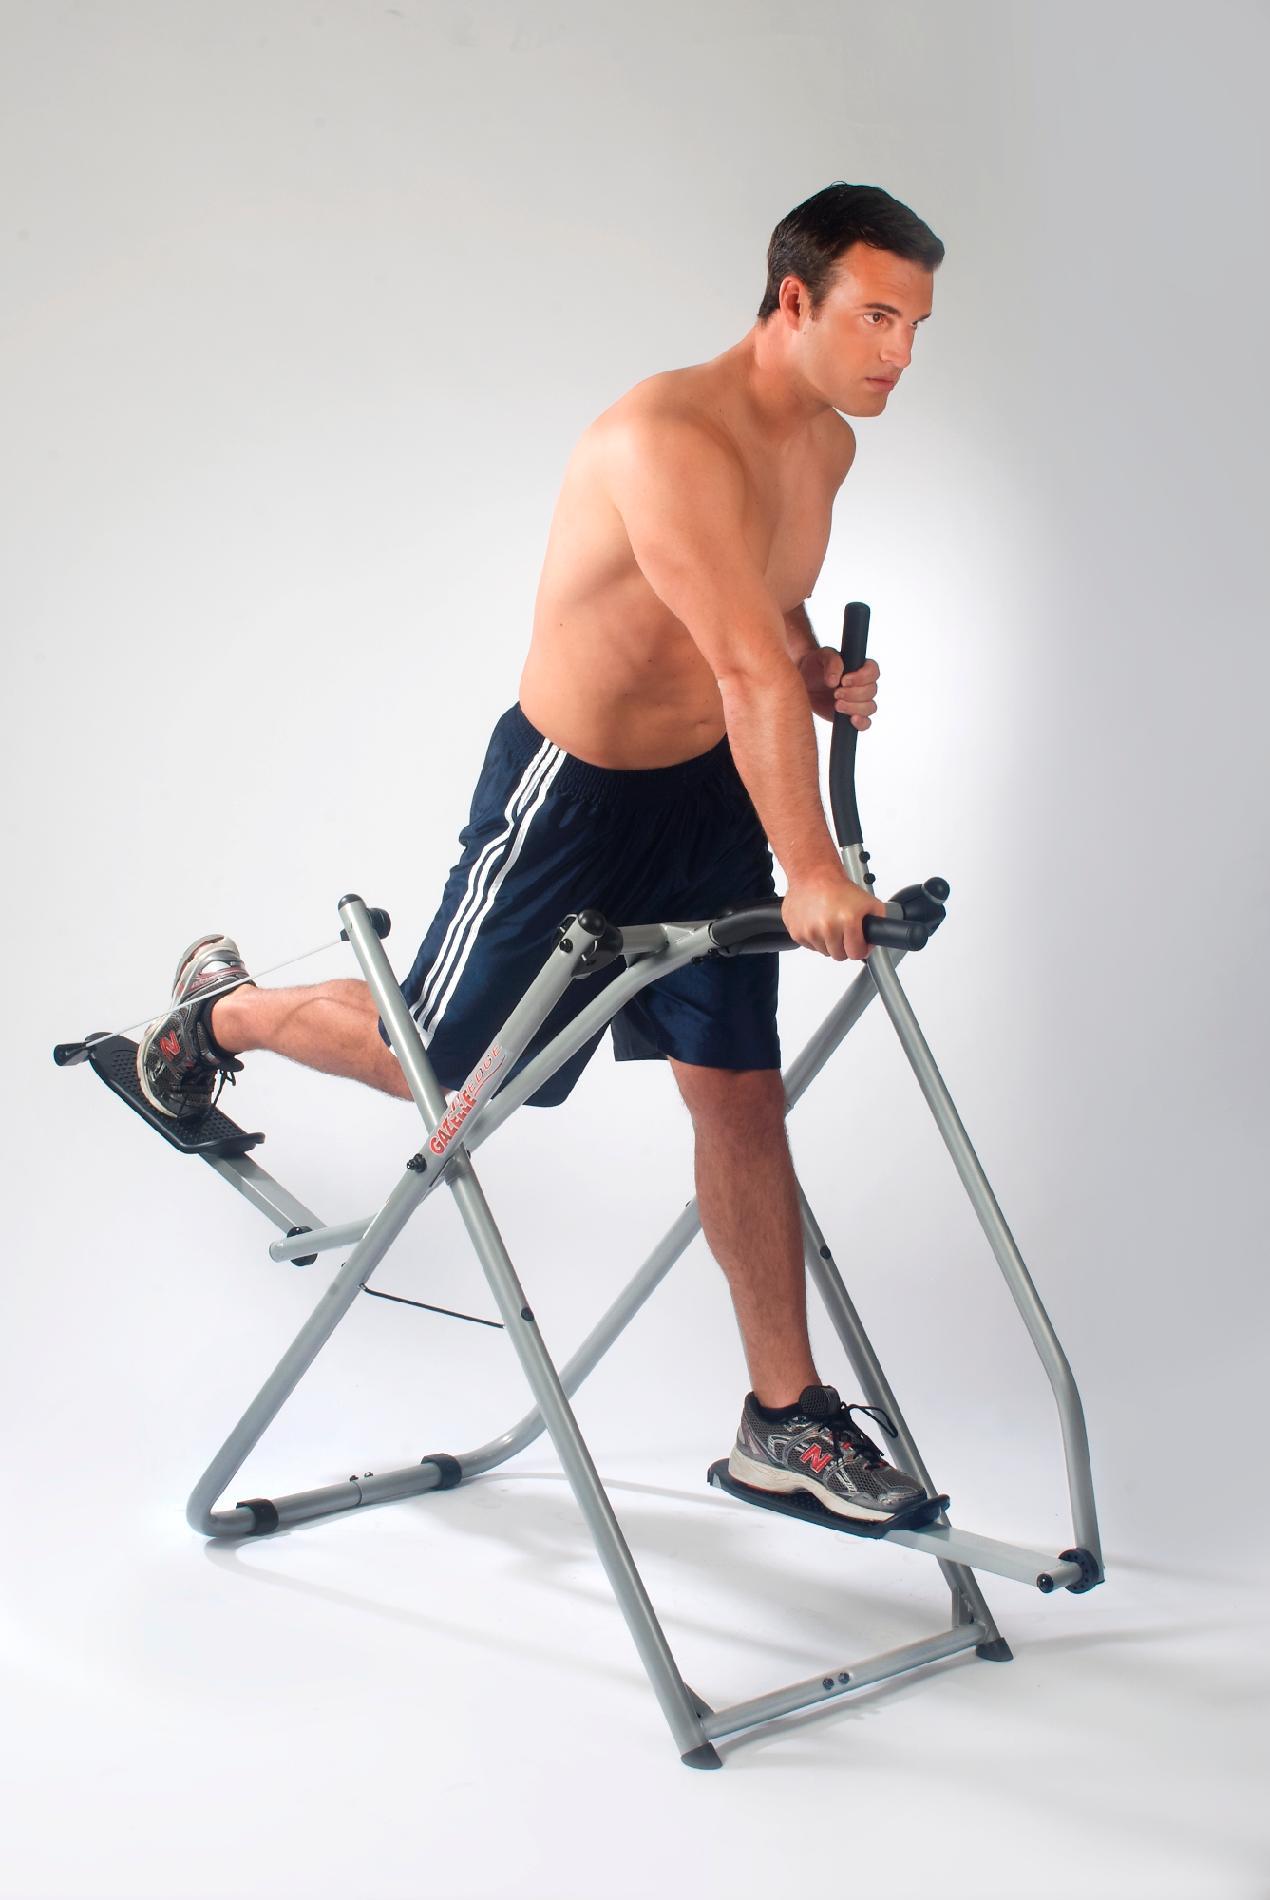 Gazelle Edge Exercise System